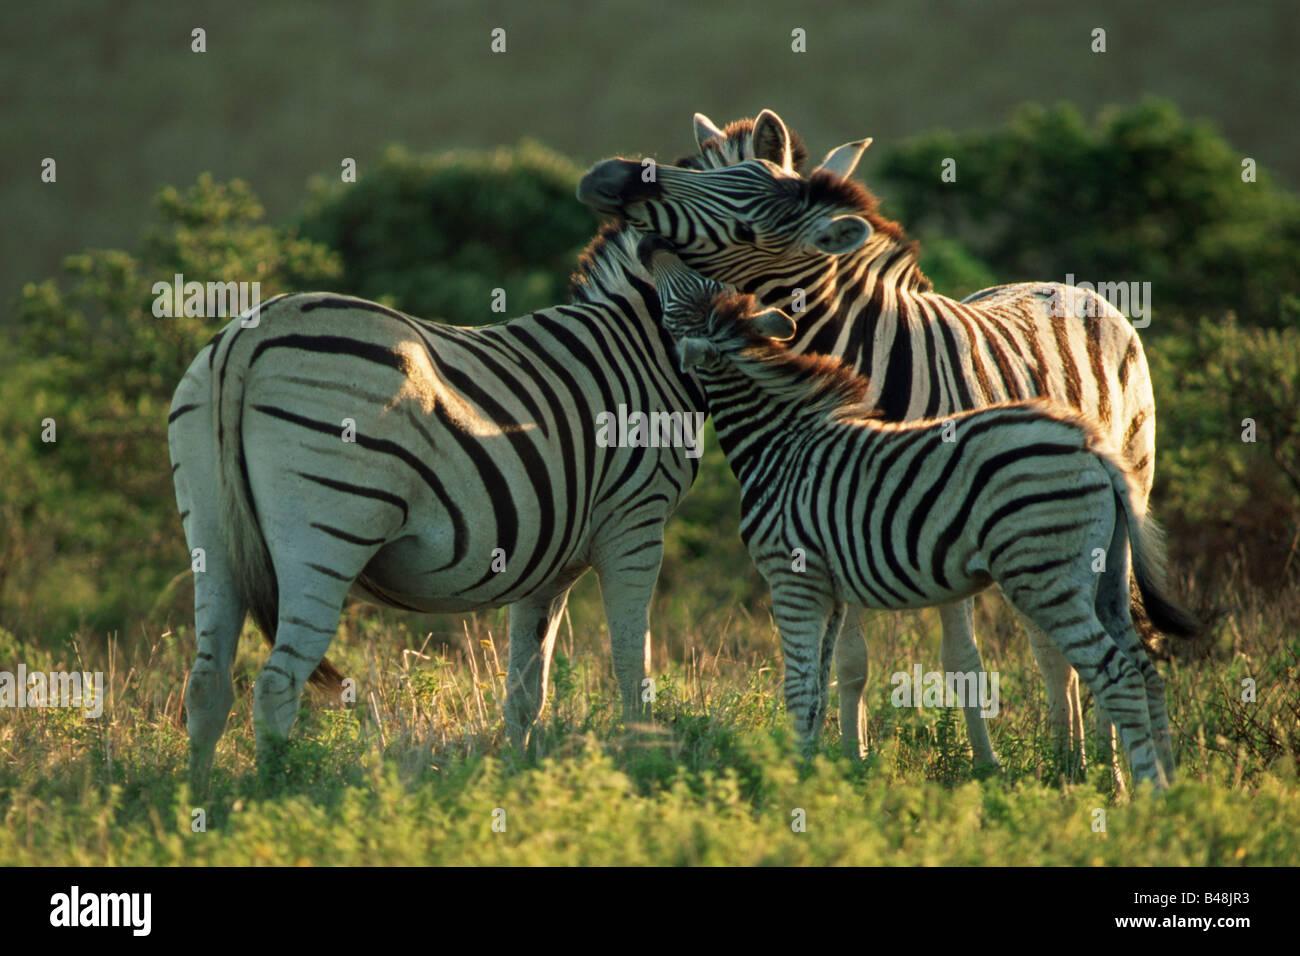 Steppenzebra Familie Mpongo Park Suedafrika Afrika Stock Photo